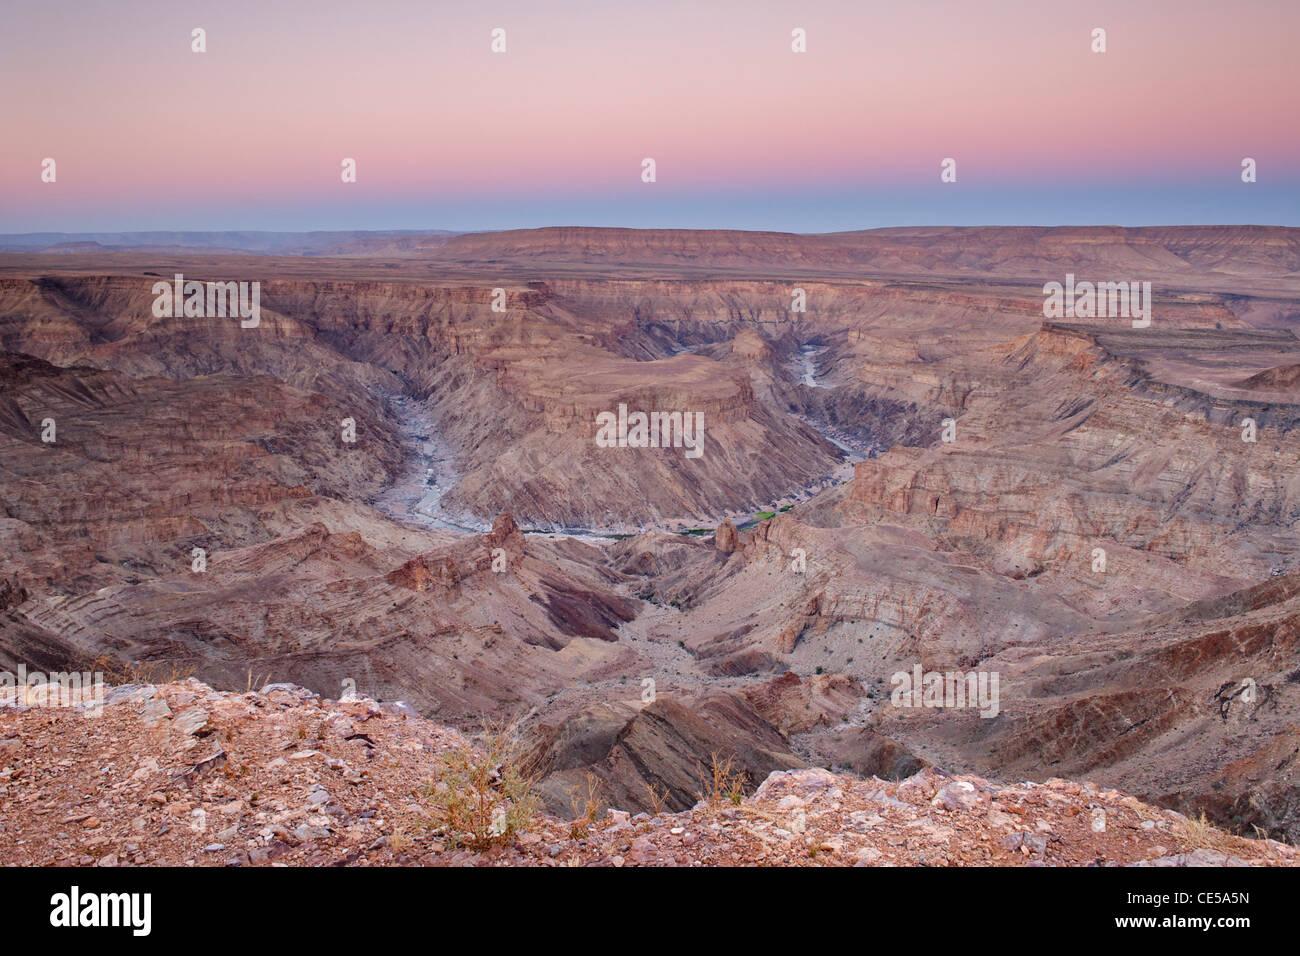 Fish River Canyon in southern Namibia at dawn. - Stock Image